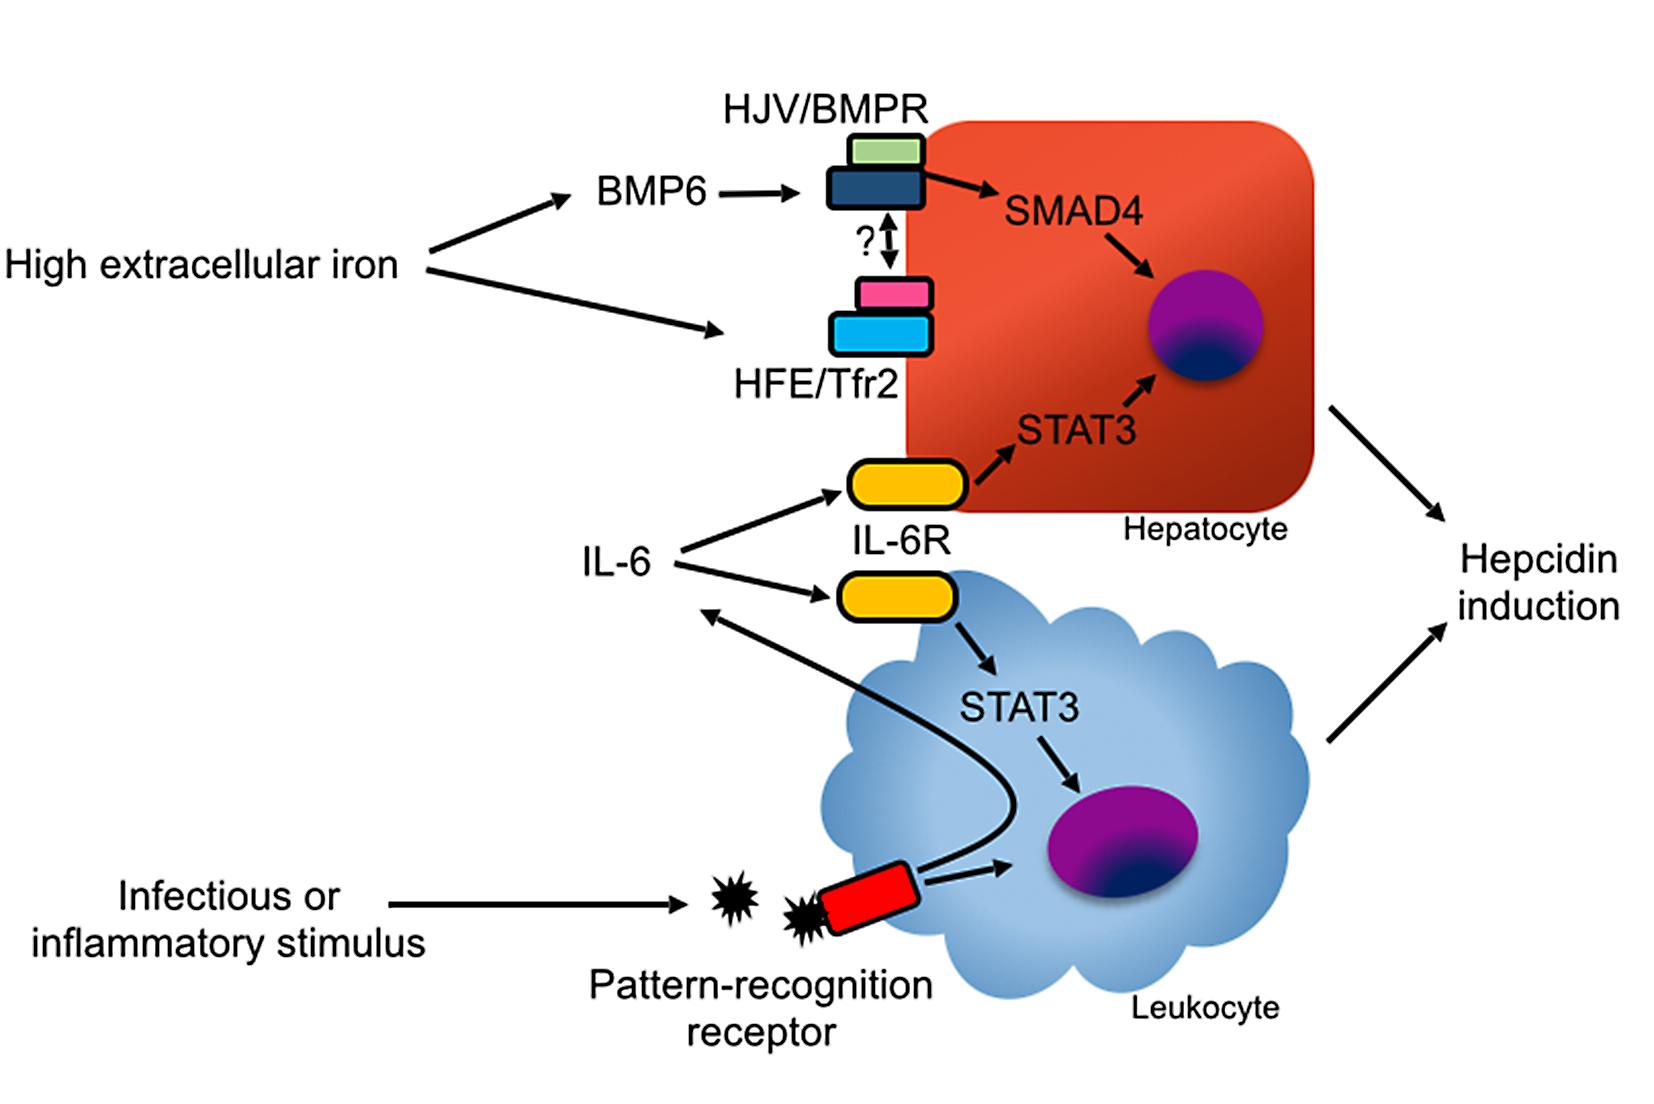 Mechanisms of hepcidin induction.